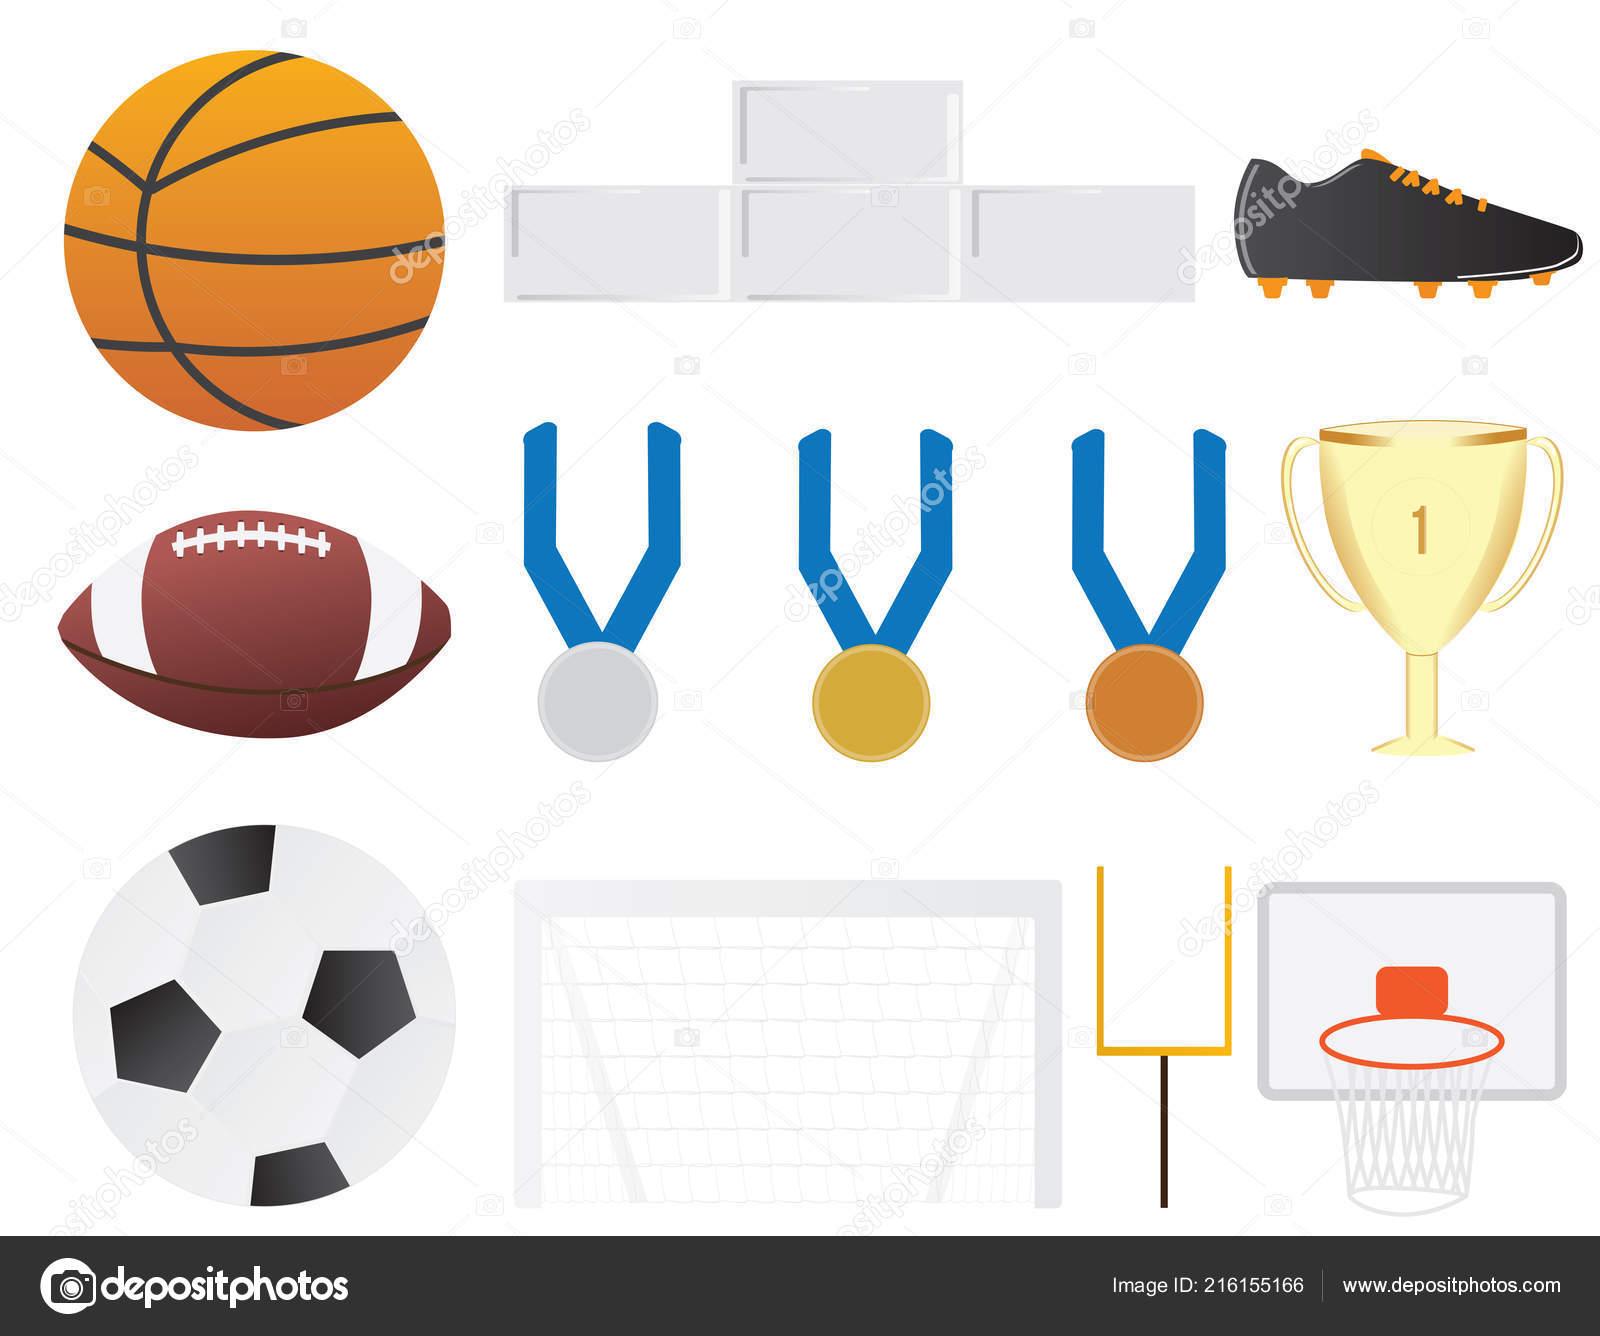 Equipe Esporte Elementos Clipart Conjunto Basquete Futebol Elementos Vetor  Futebol — Vetores de Stock ca580c491c301